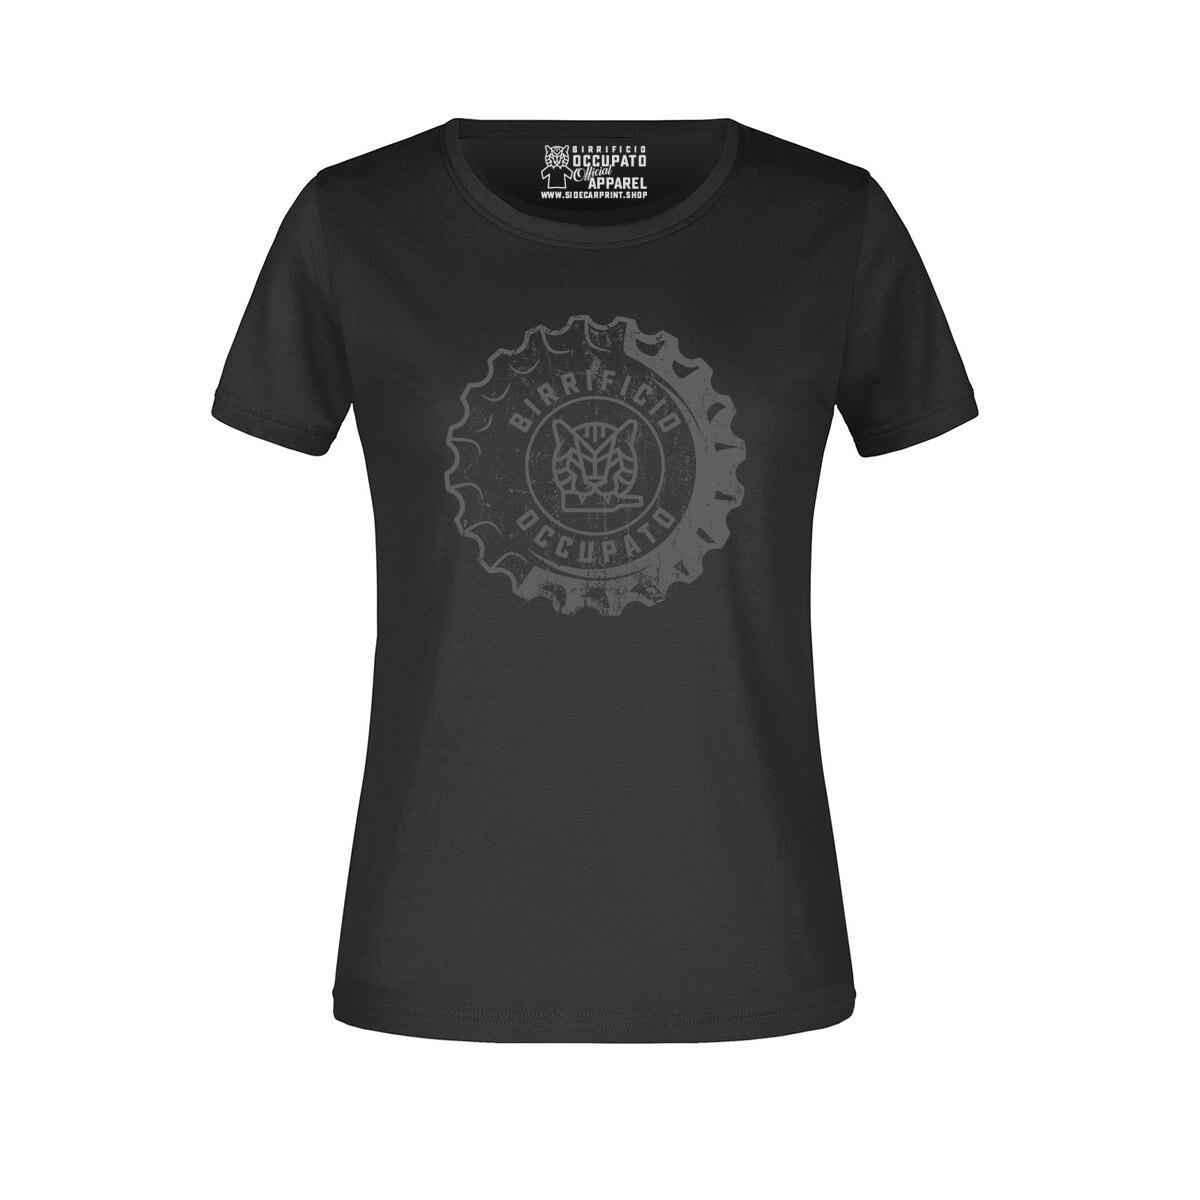 "T-shirt Donna ""Tappone"" Black - Lim.Ed. Spring 2021"